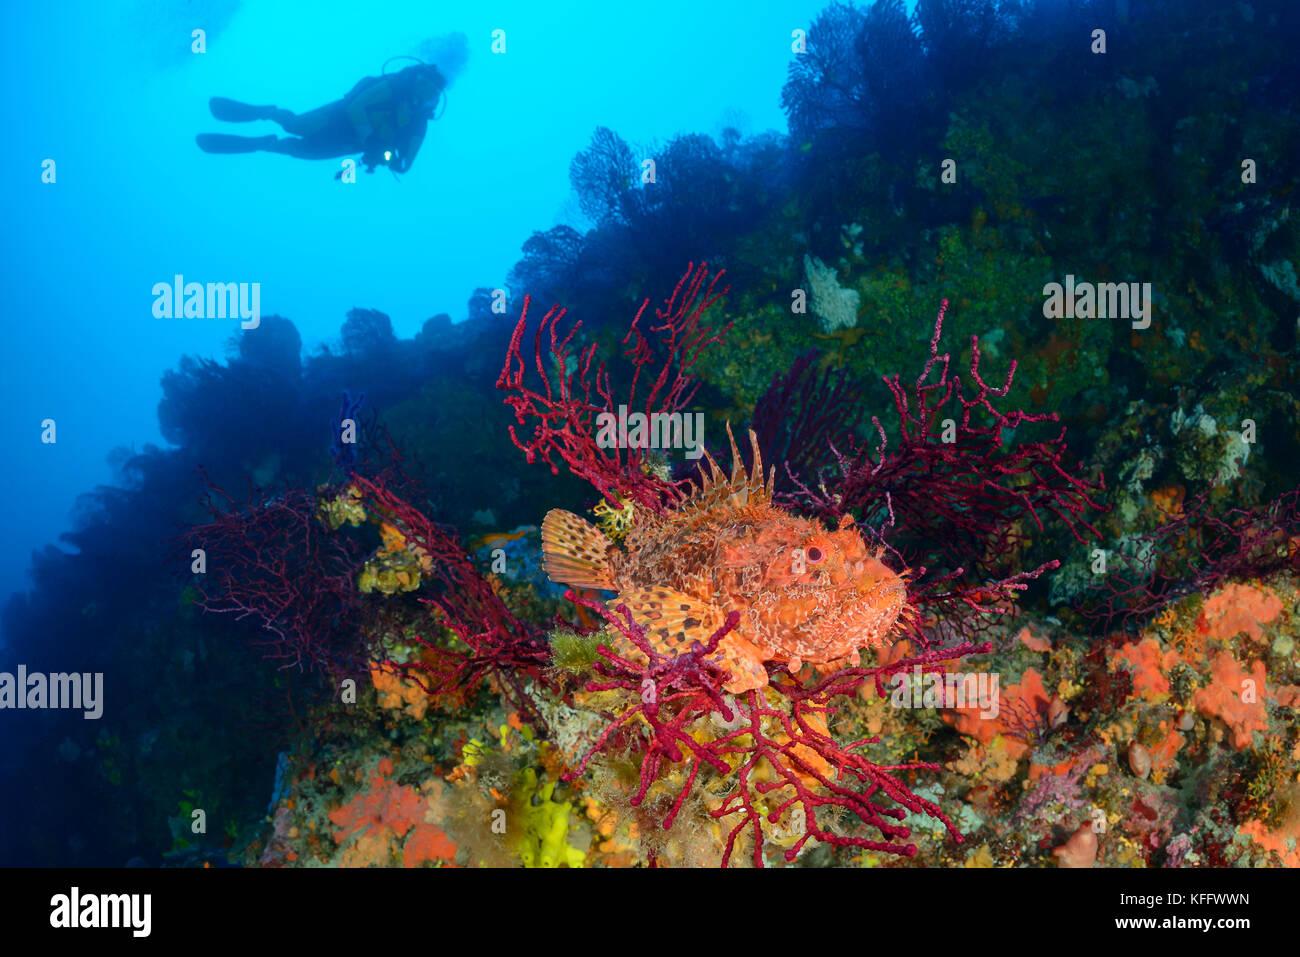 Orange Scorpionfish Stockfotos & Orange Scorpionfish Bilder - Alamy